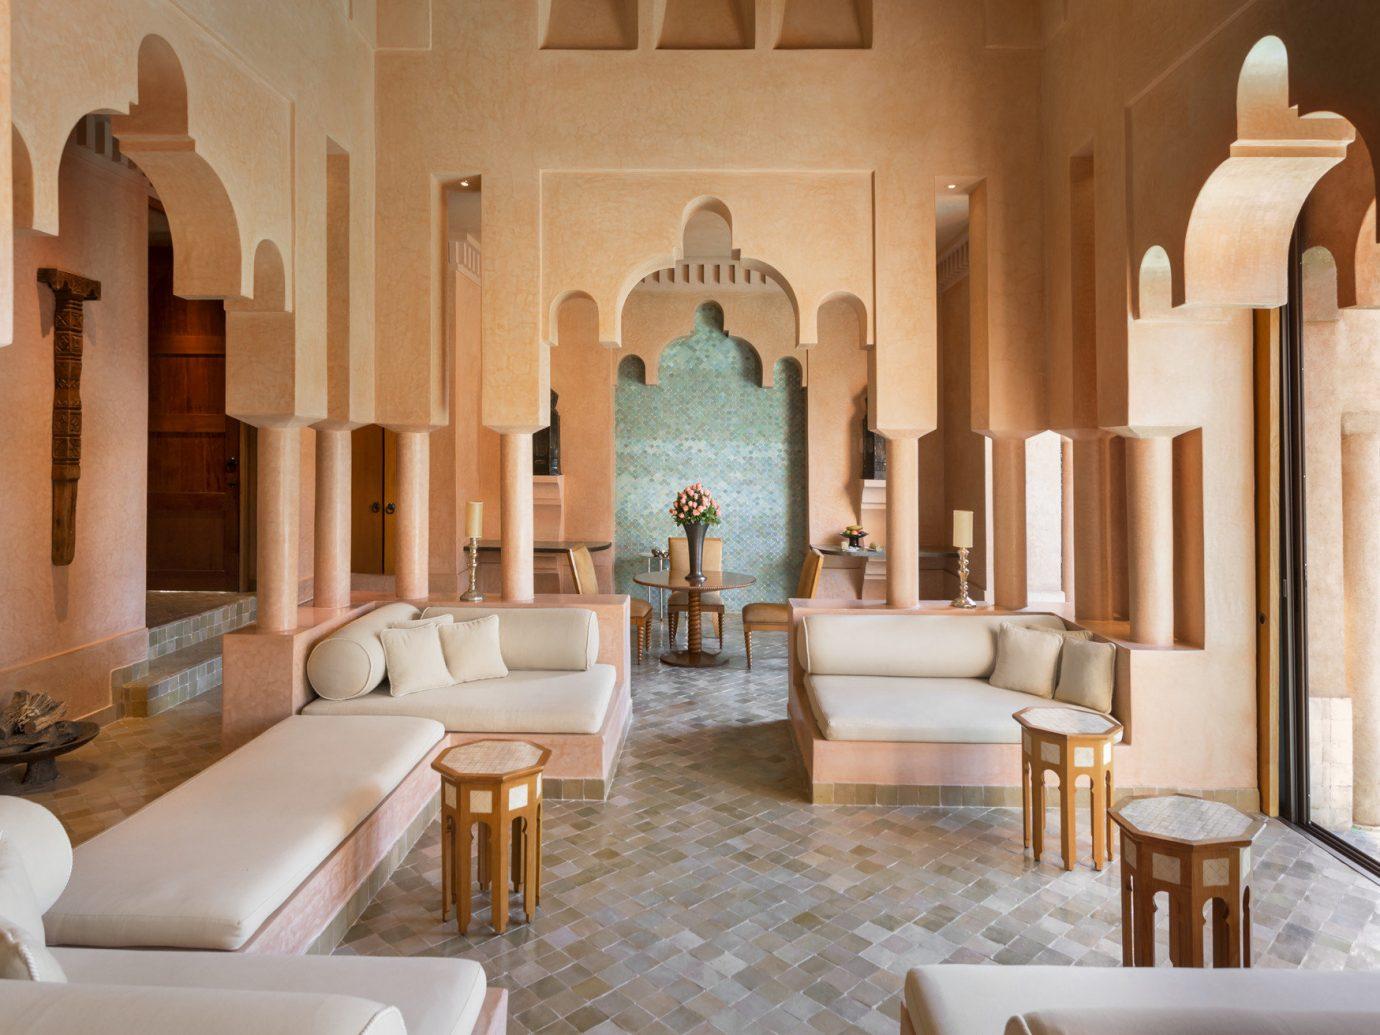 Hotels indoor floor Living property room estate interior design living room mansion palace furniture Lobby Villa